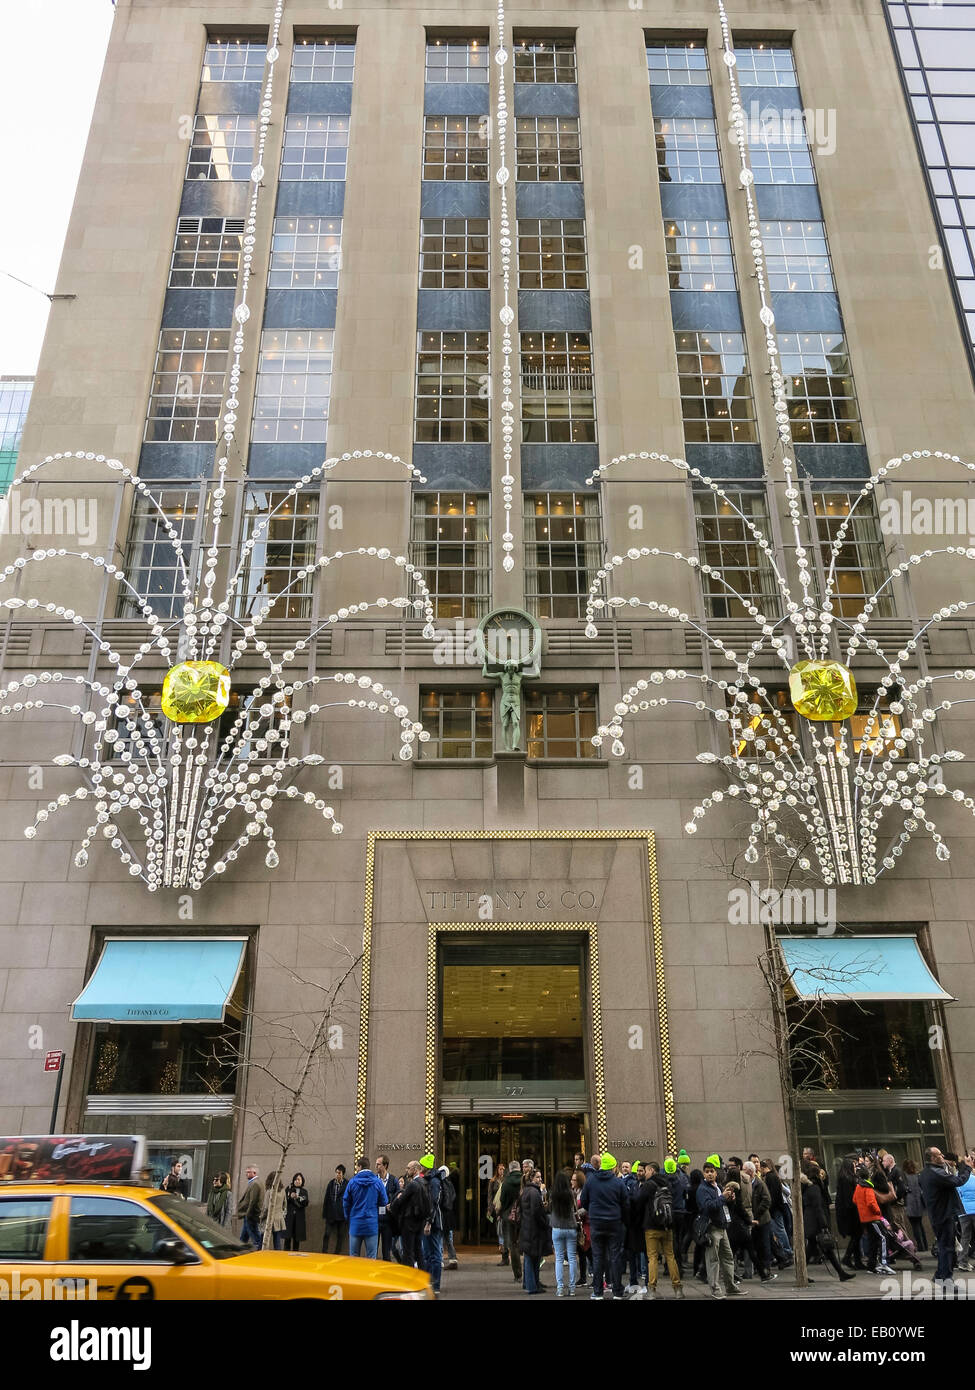 Tiffany & Co., Jewelry Store, Holiday Decorations, NYC